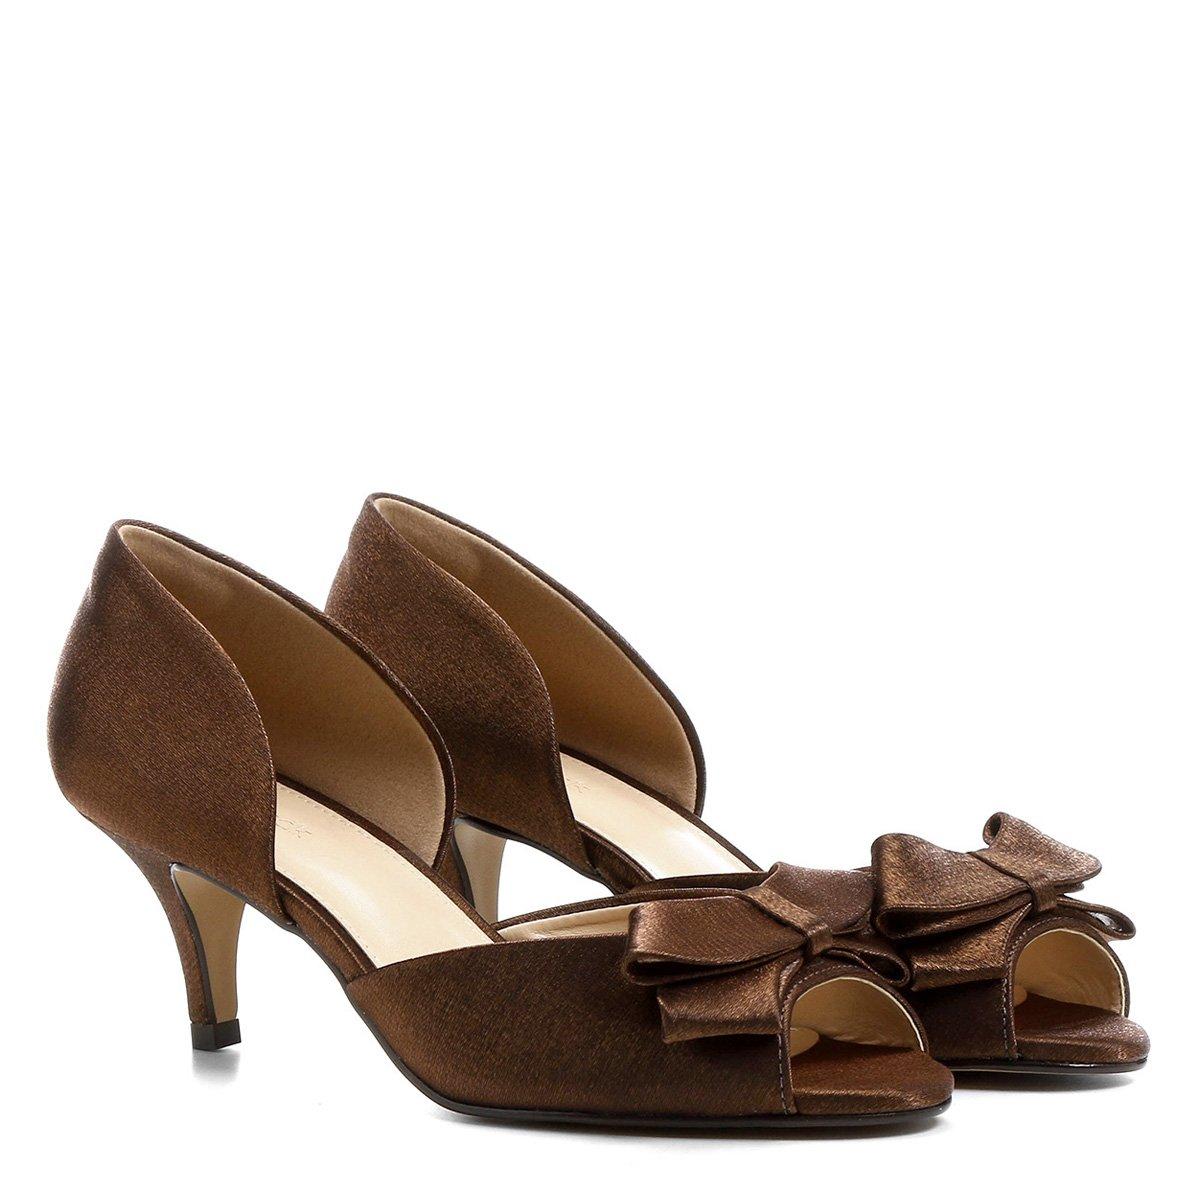 0e83b75093a0 Peep Toe Shoestock Festa Baixo Semi Cetim Laço - Cobre | Shoestock